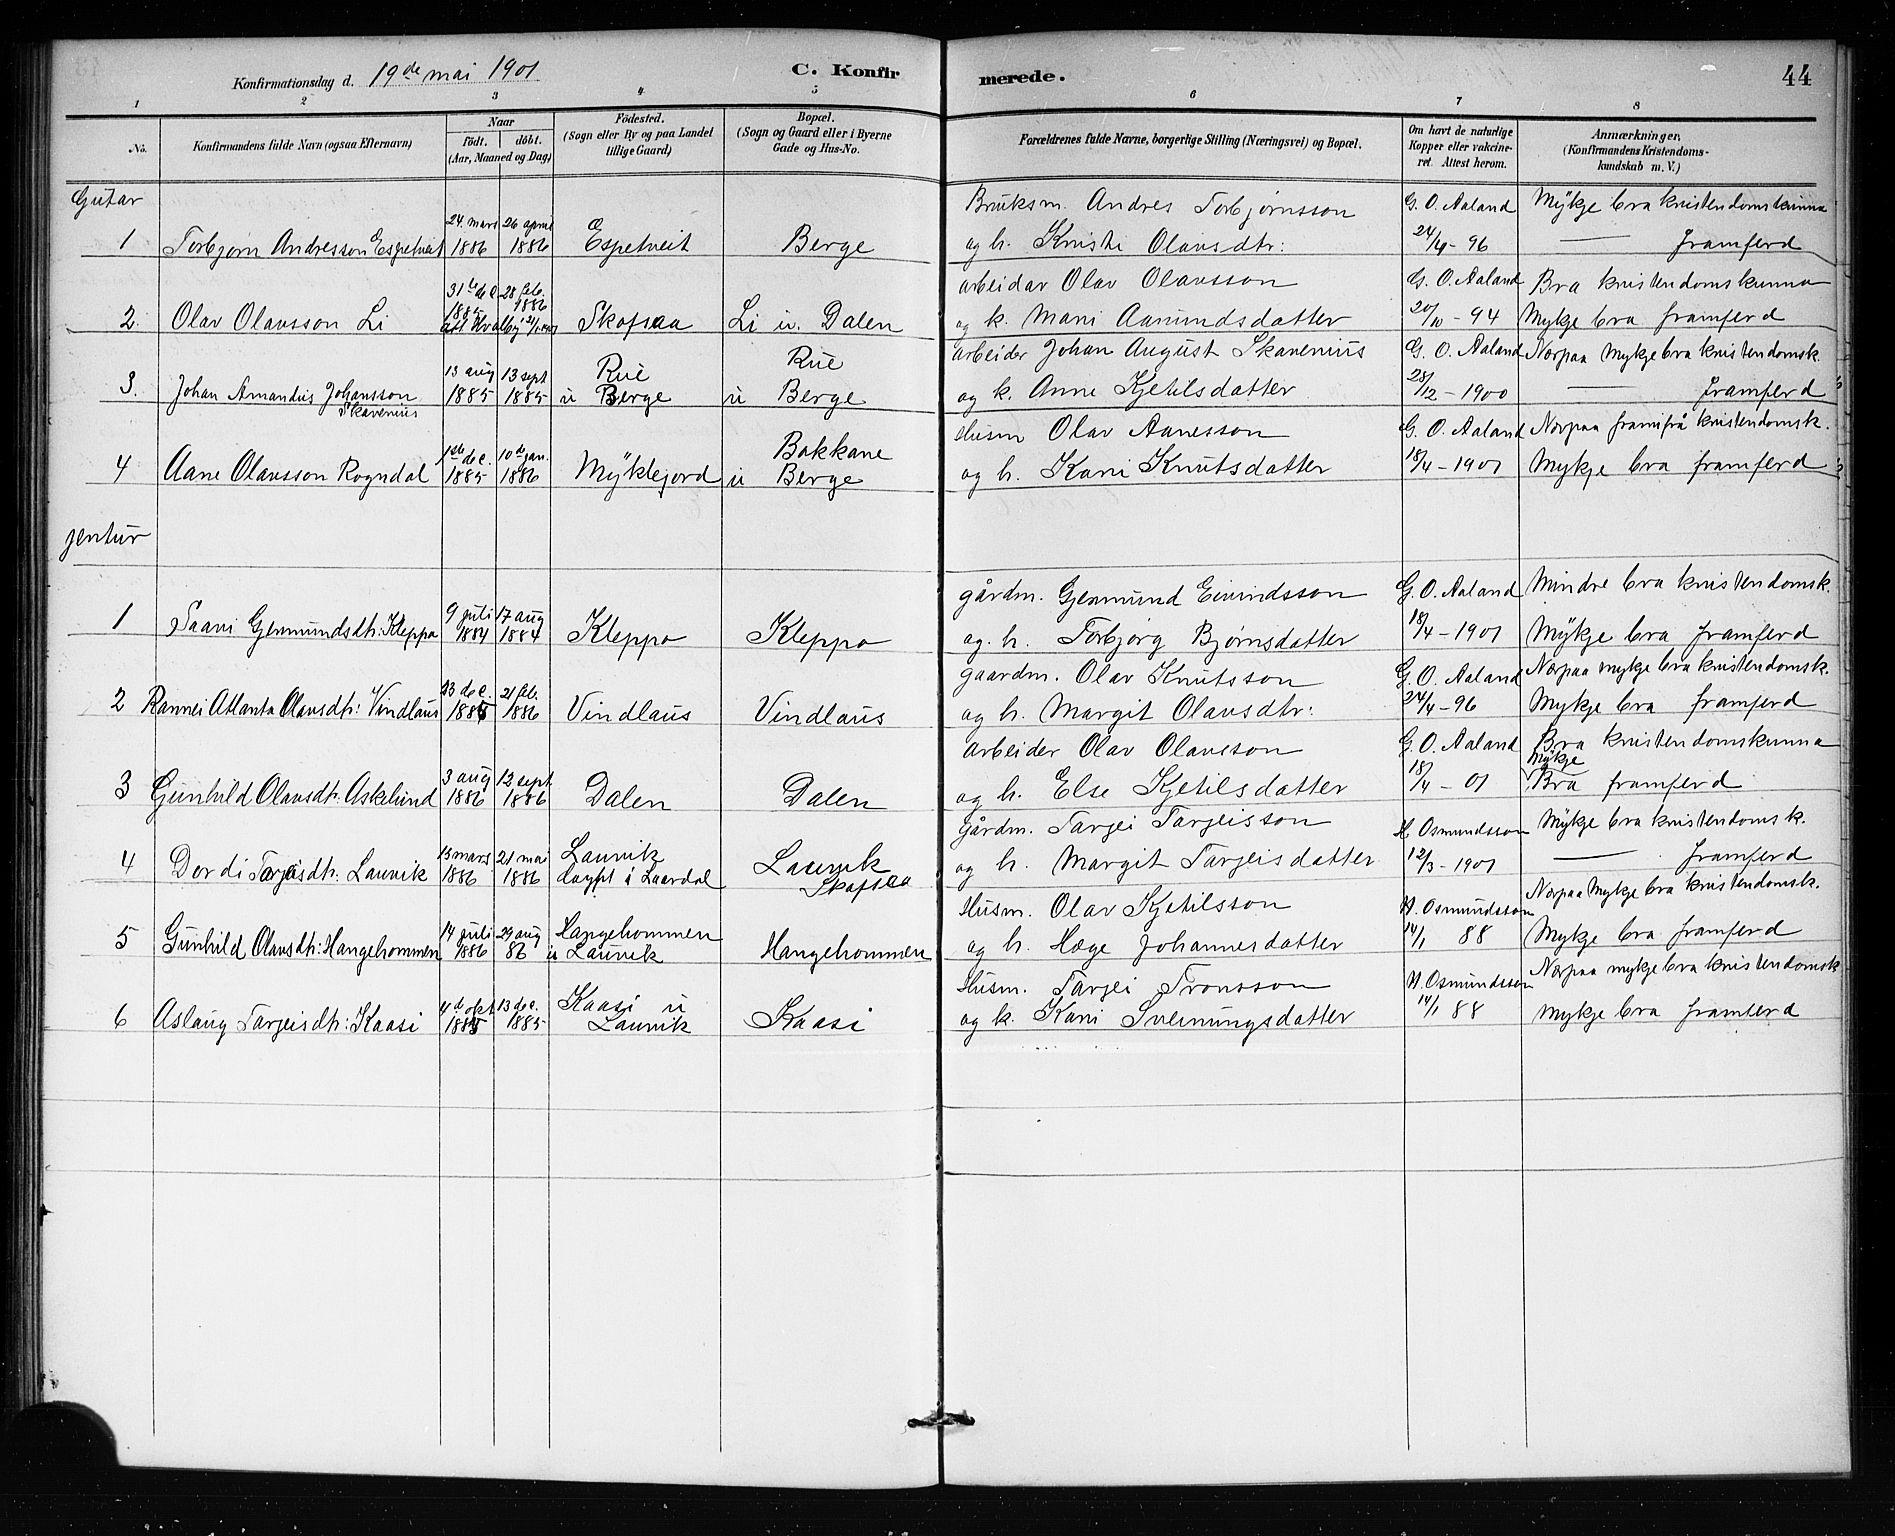 SAKO, Lårdal kirkebøker, G/Gb/L0003: Klokkerbok nr. II 3, 1889-1920, s. 44